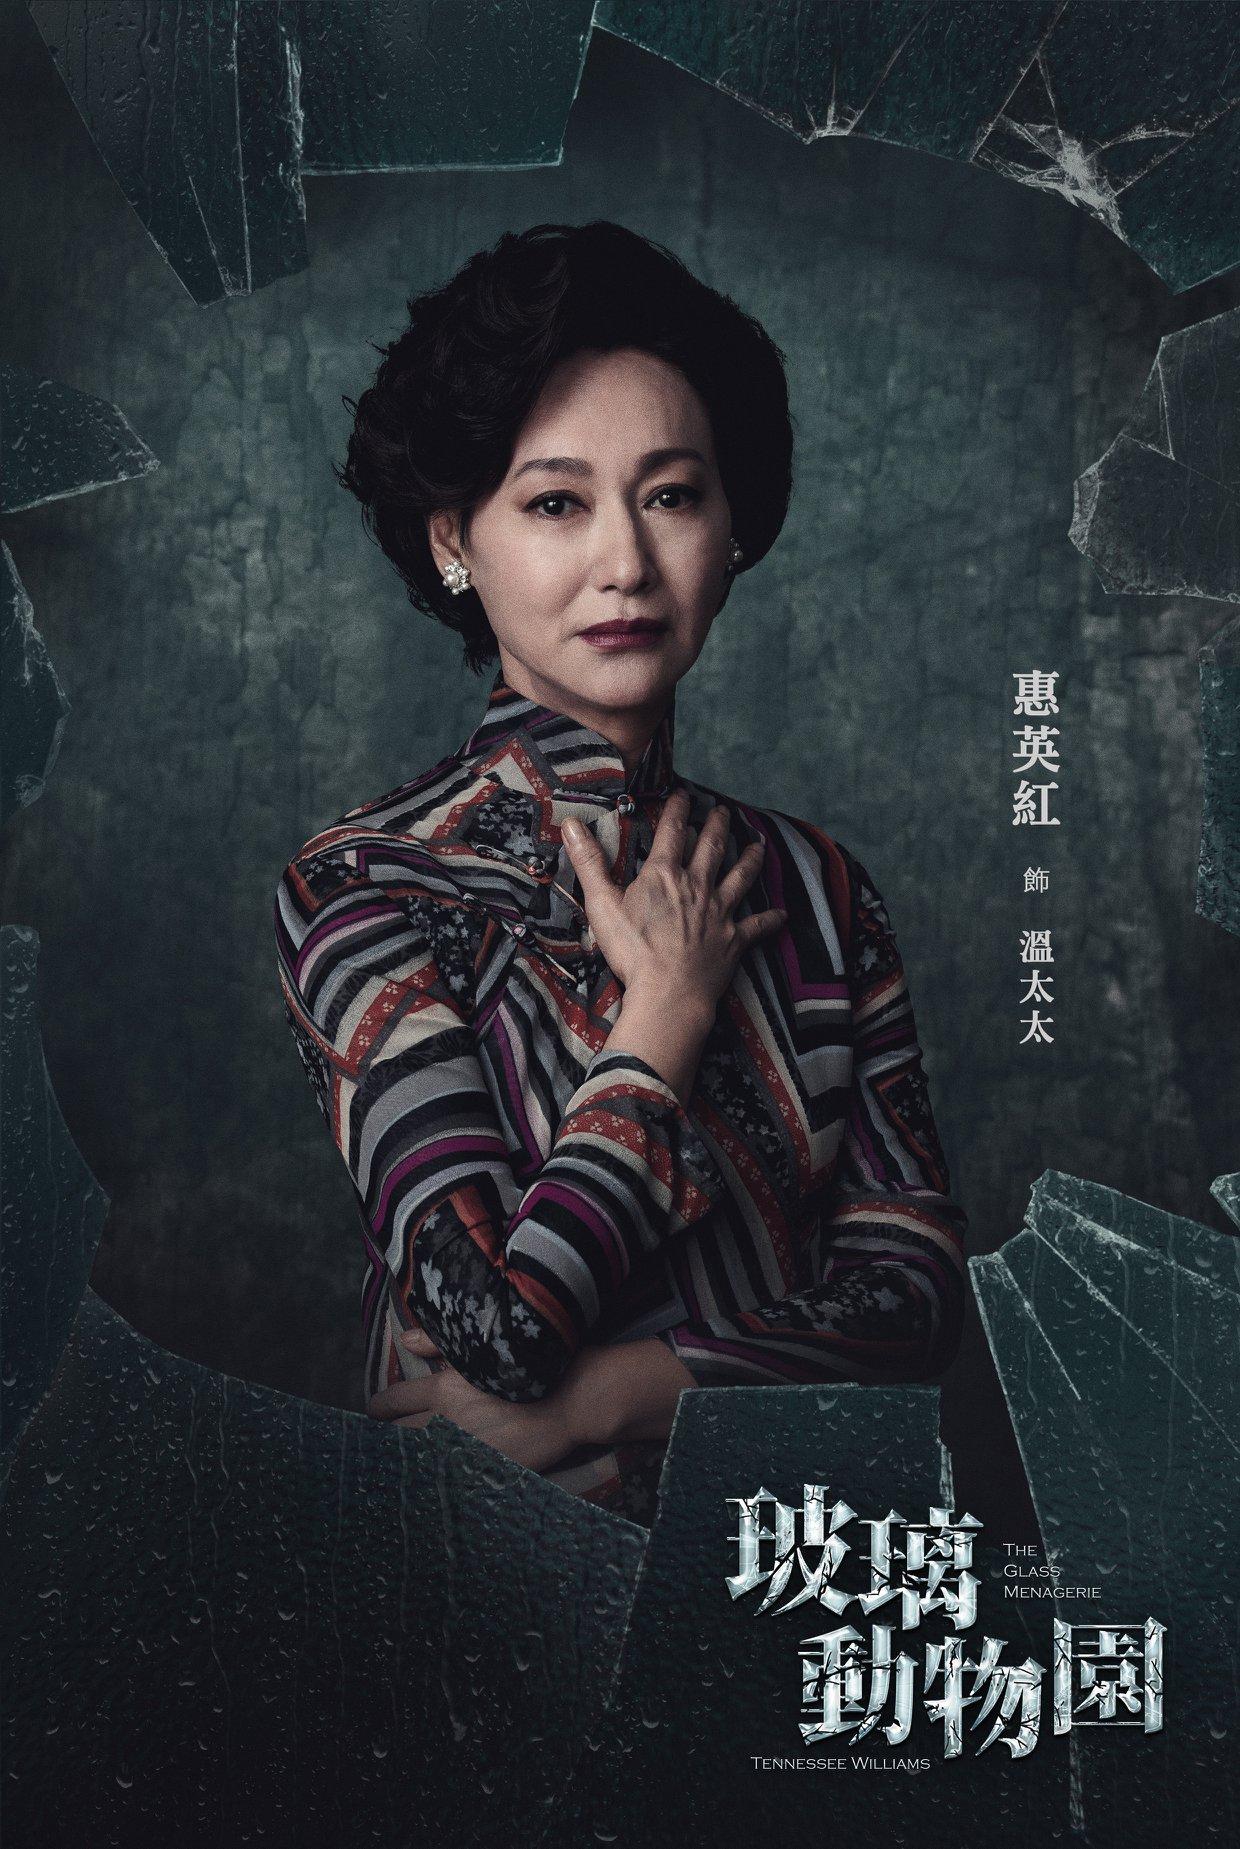 The Glass Menagerie. Kara Wai 惠英紅. Hong Kong. 2018